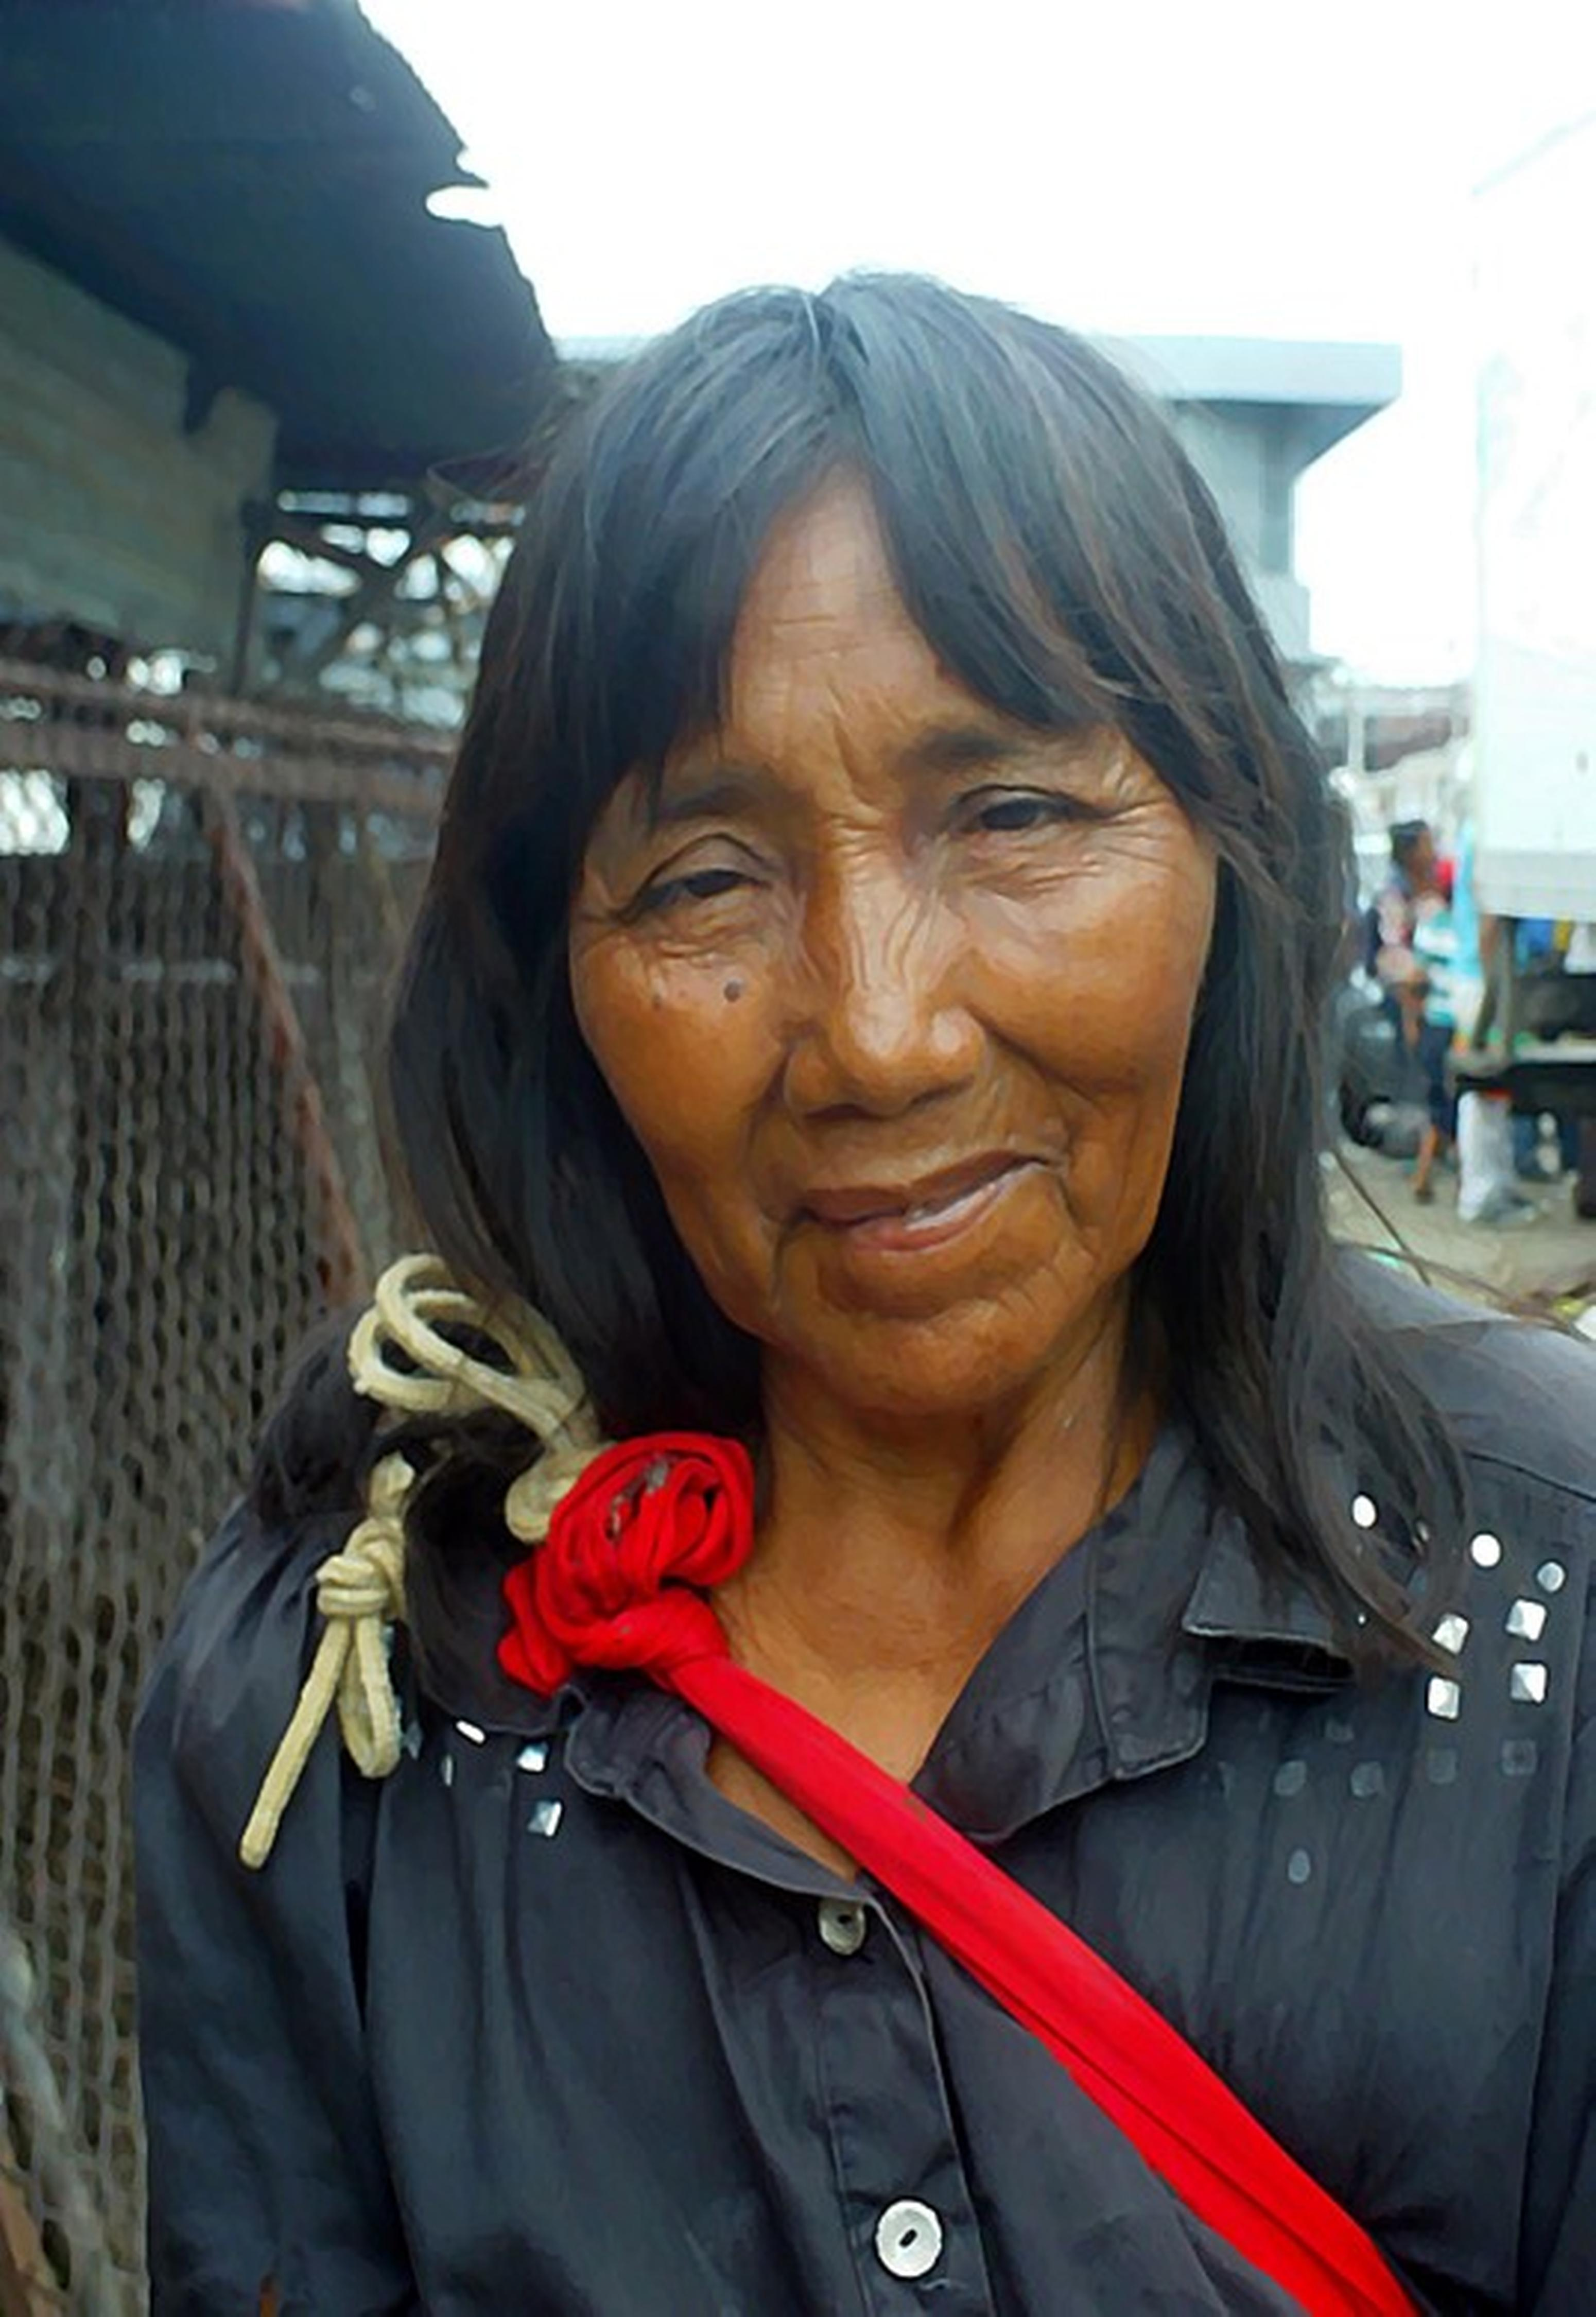 Indígena venezolana (2020) - Liliana Durán Torreyes - Laura Edelstein